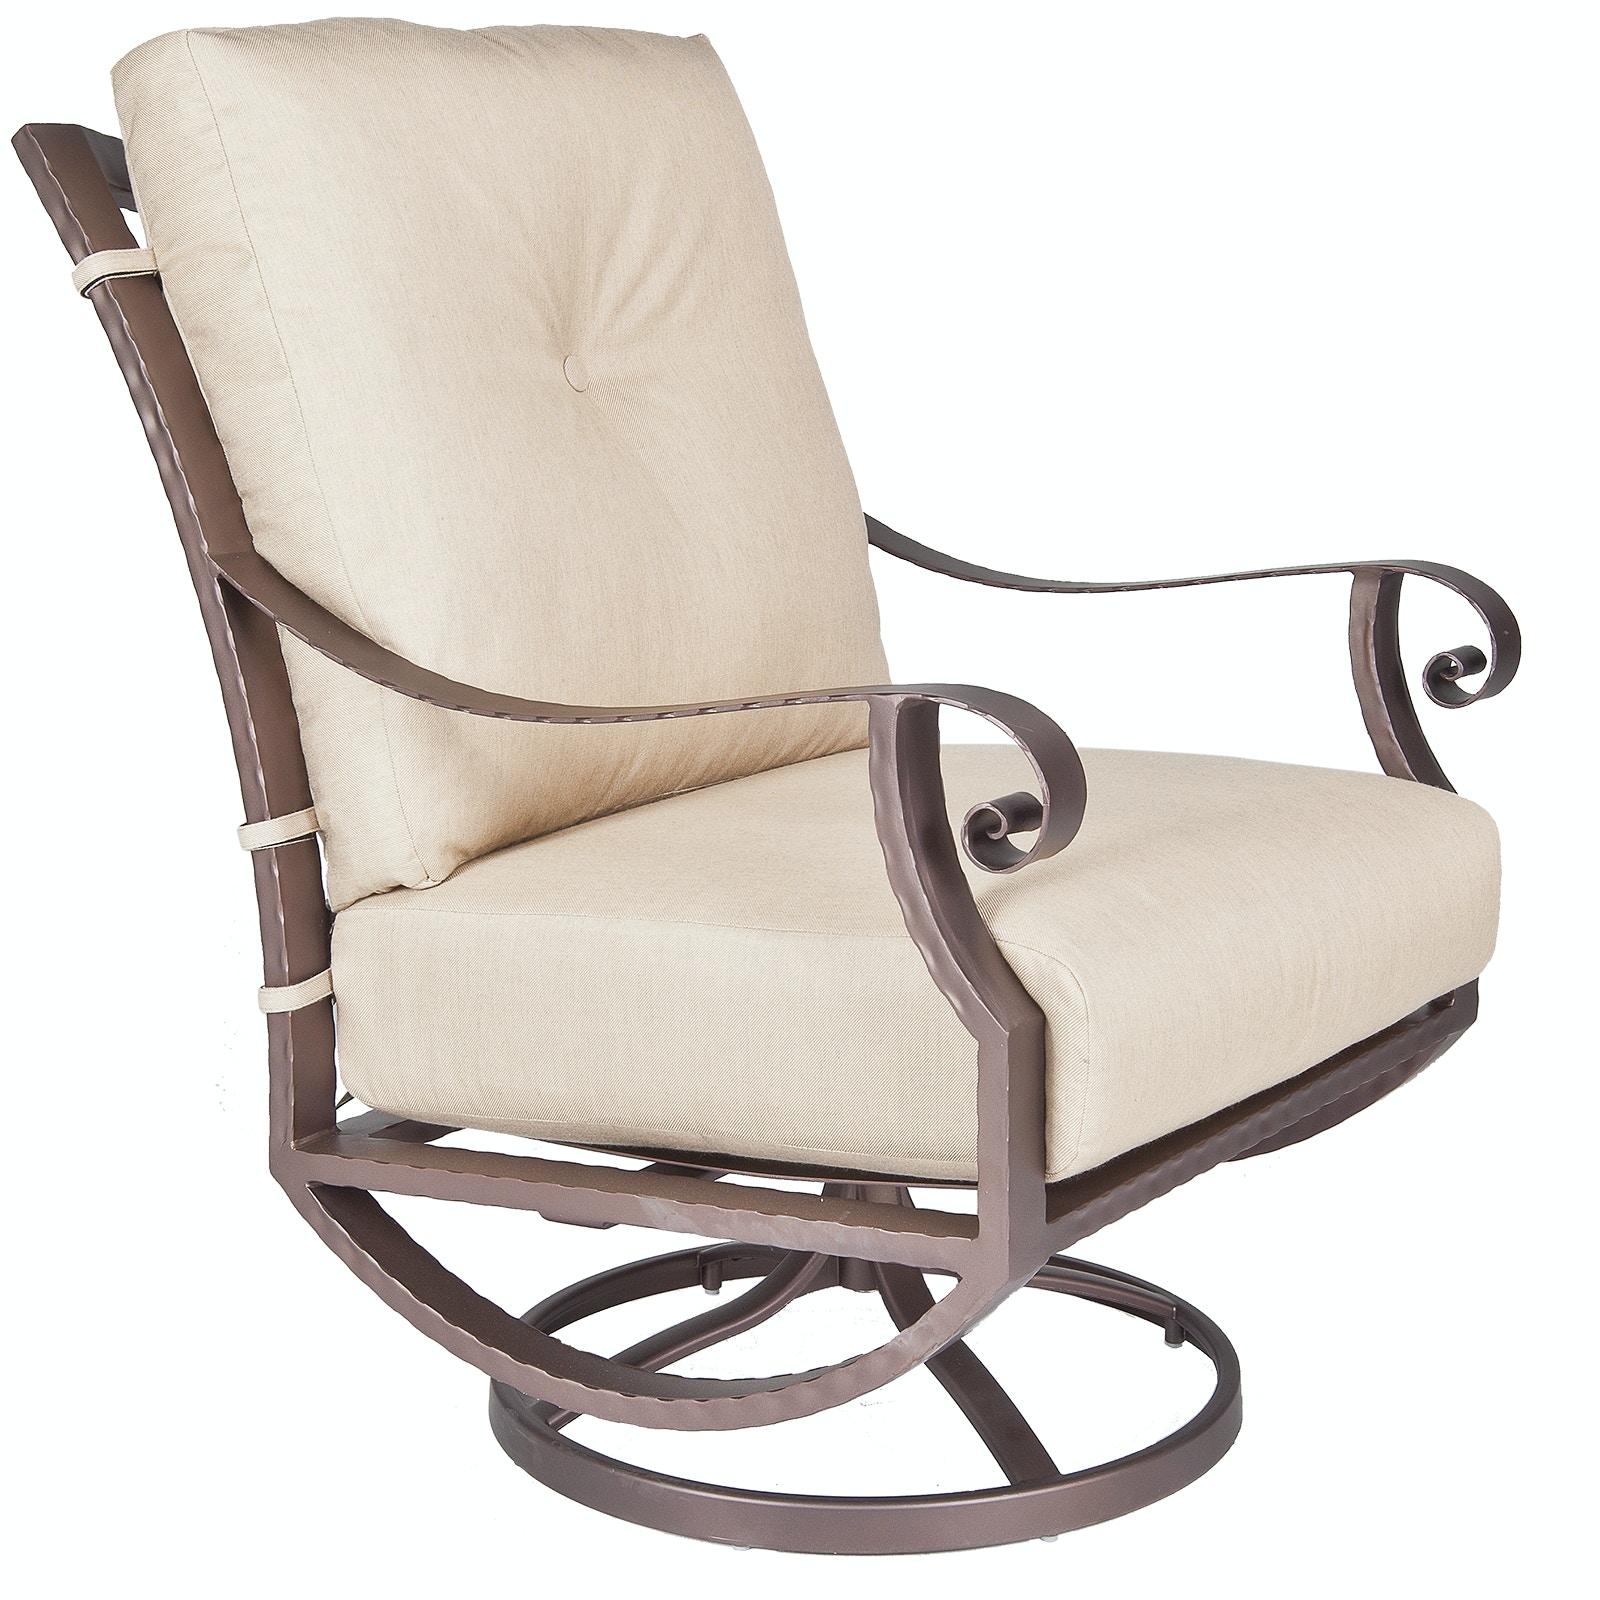 OW Lee Furniture Luna Swivel Rocker Lounge Chair 32125 SR